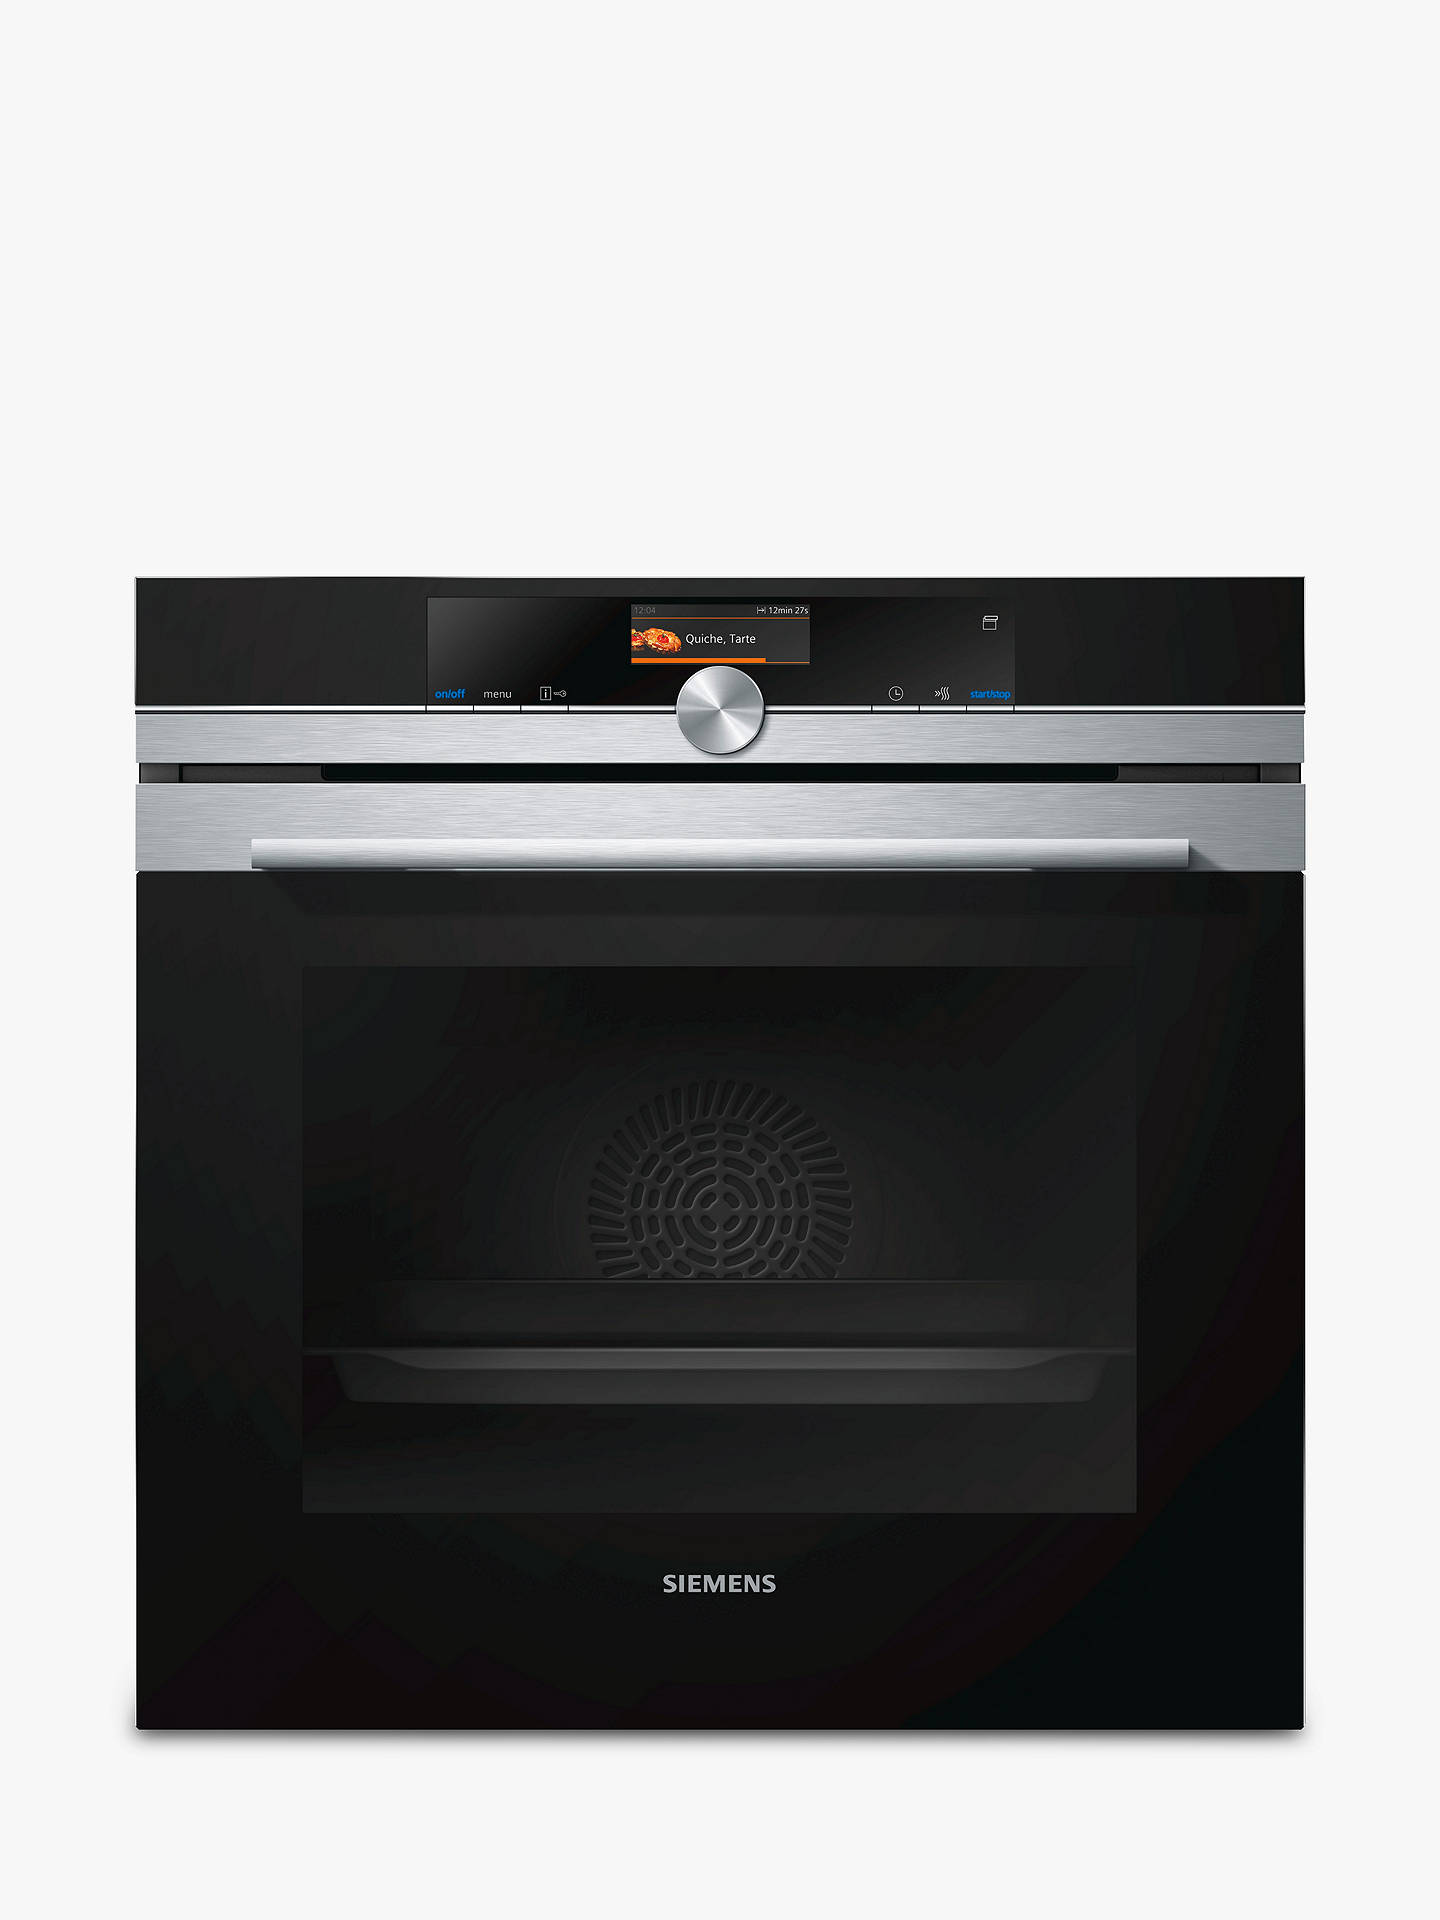 siemens hr676gbs6b built in single oven at john lewis. Black Bedroom Furniture Sets. Home Design Ideas